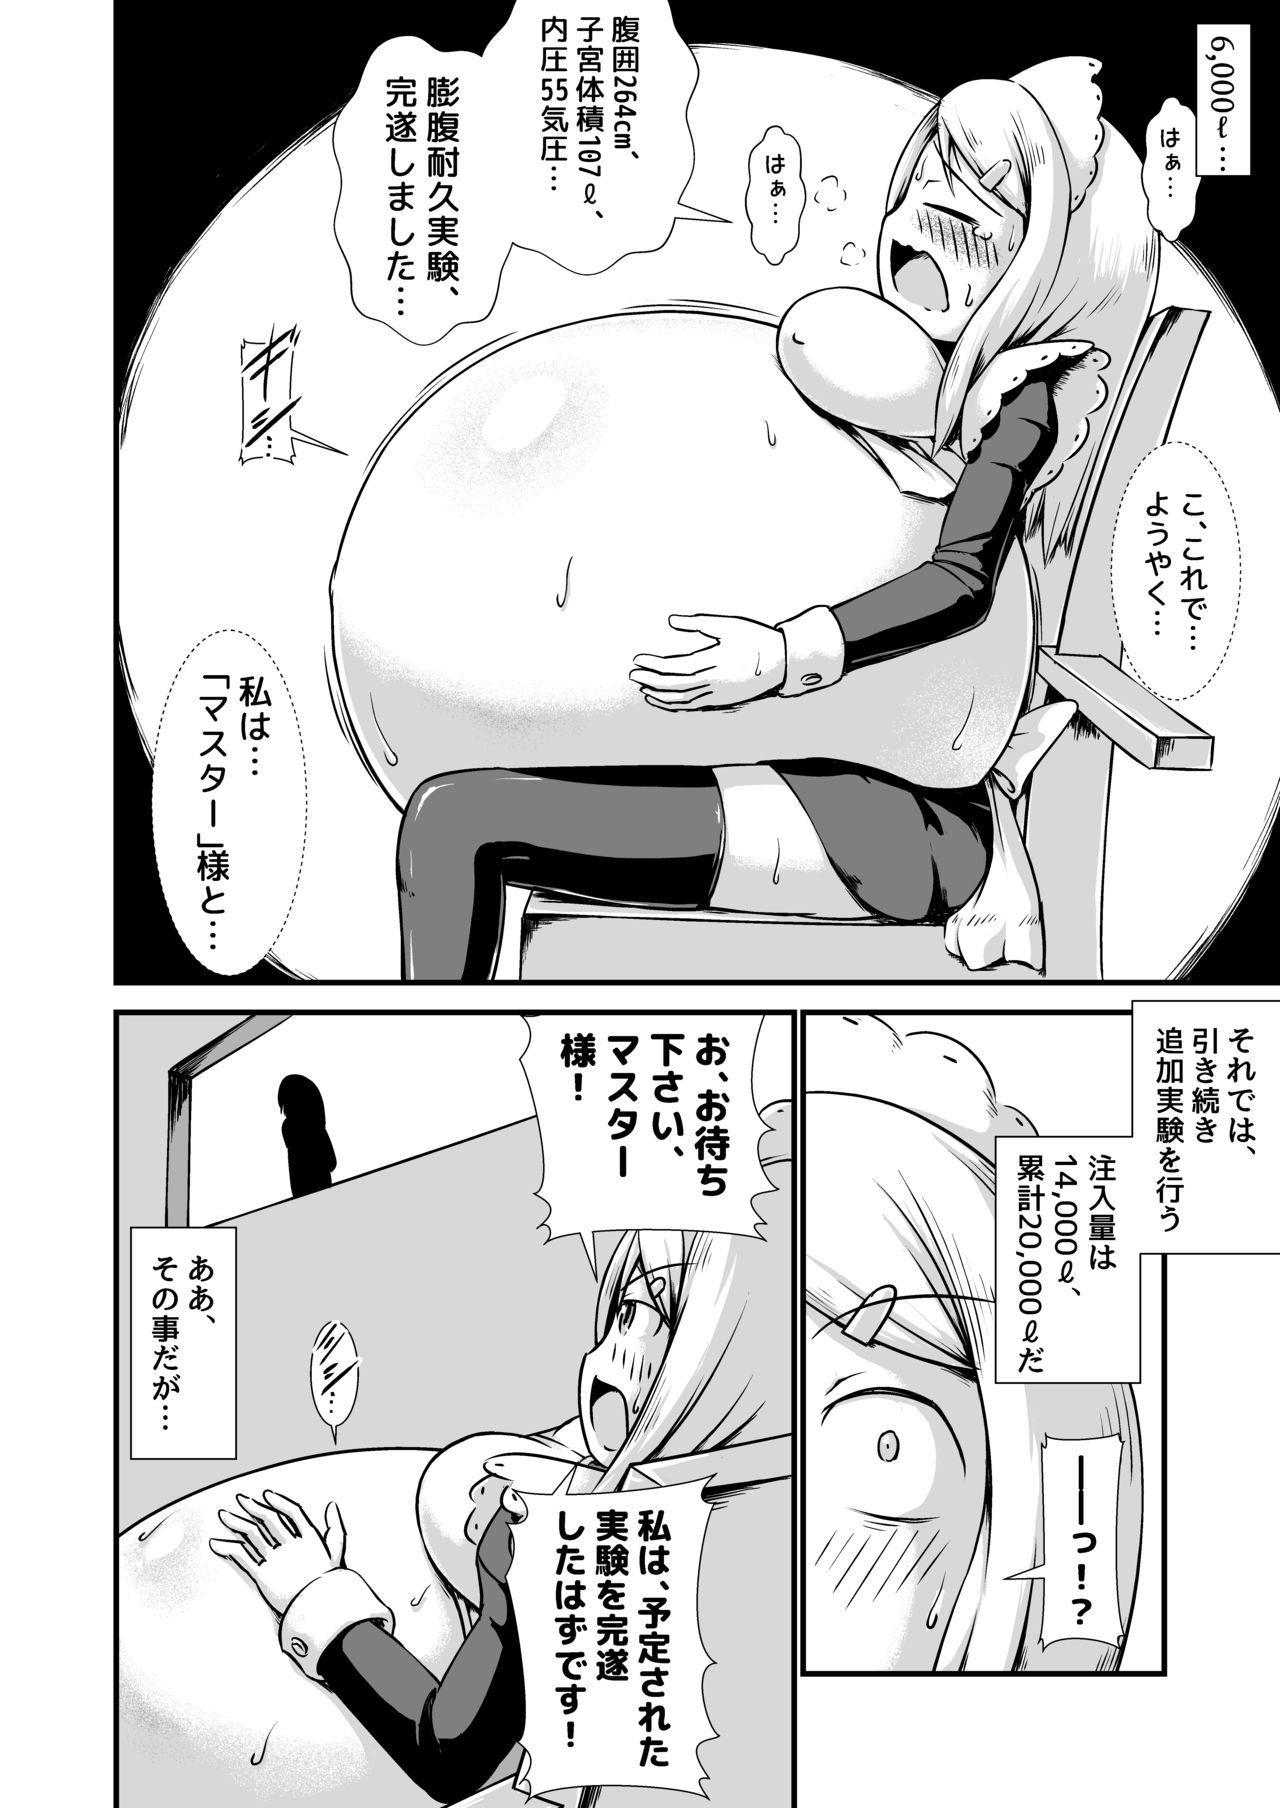 Maid-san Boufuku Taikyuu Jikken 7